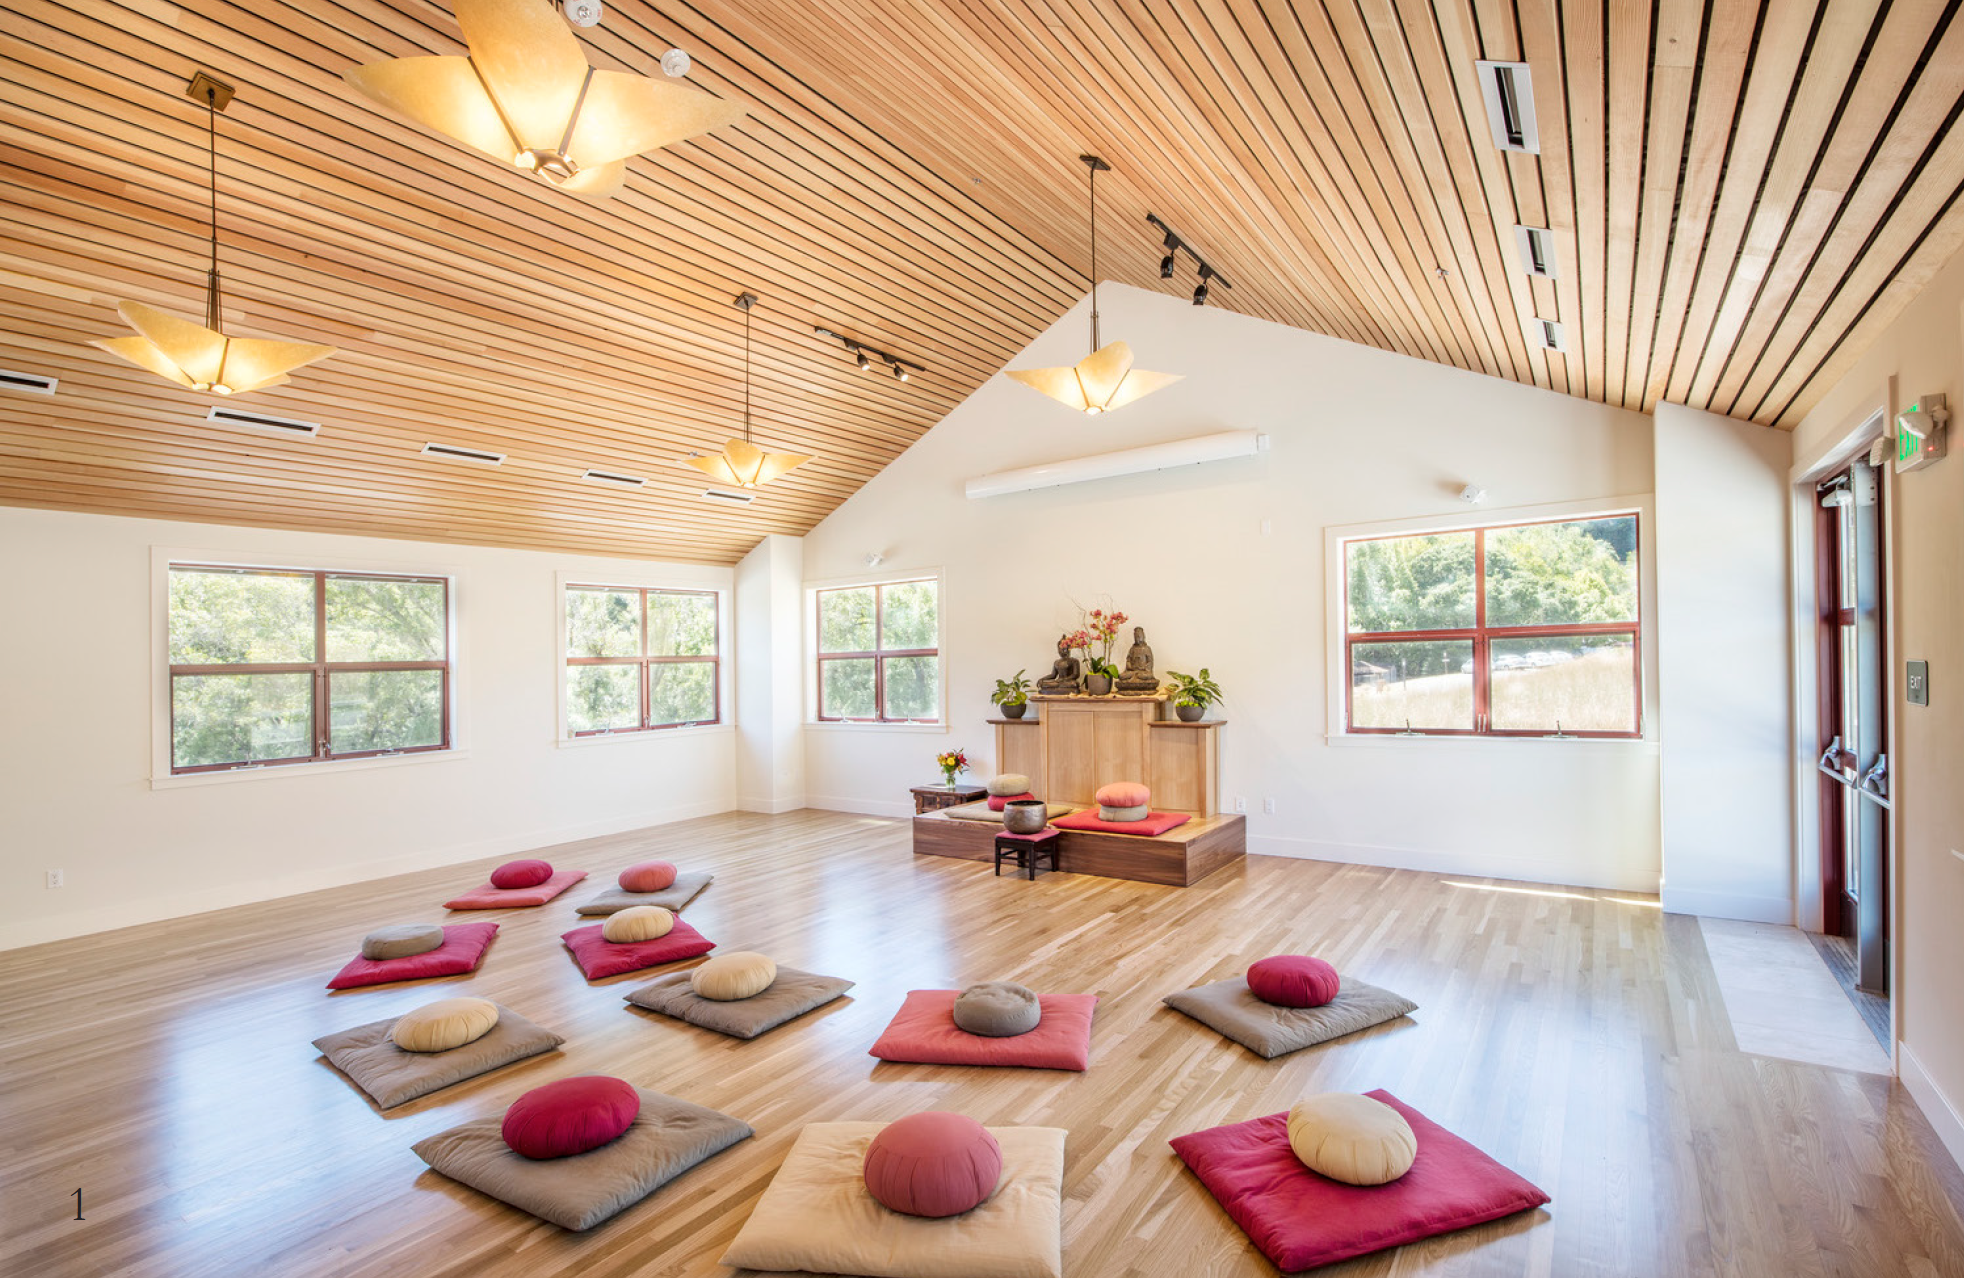 Spirit Rock Meditation Hall Note Furniture Focal Point Ceiling Roof Lighting Meditation Space Insight Meditation Meditation Center